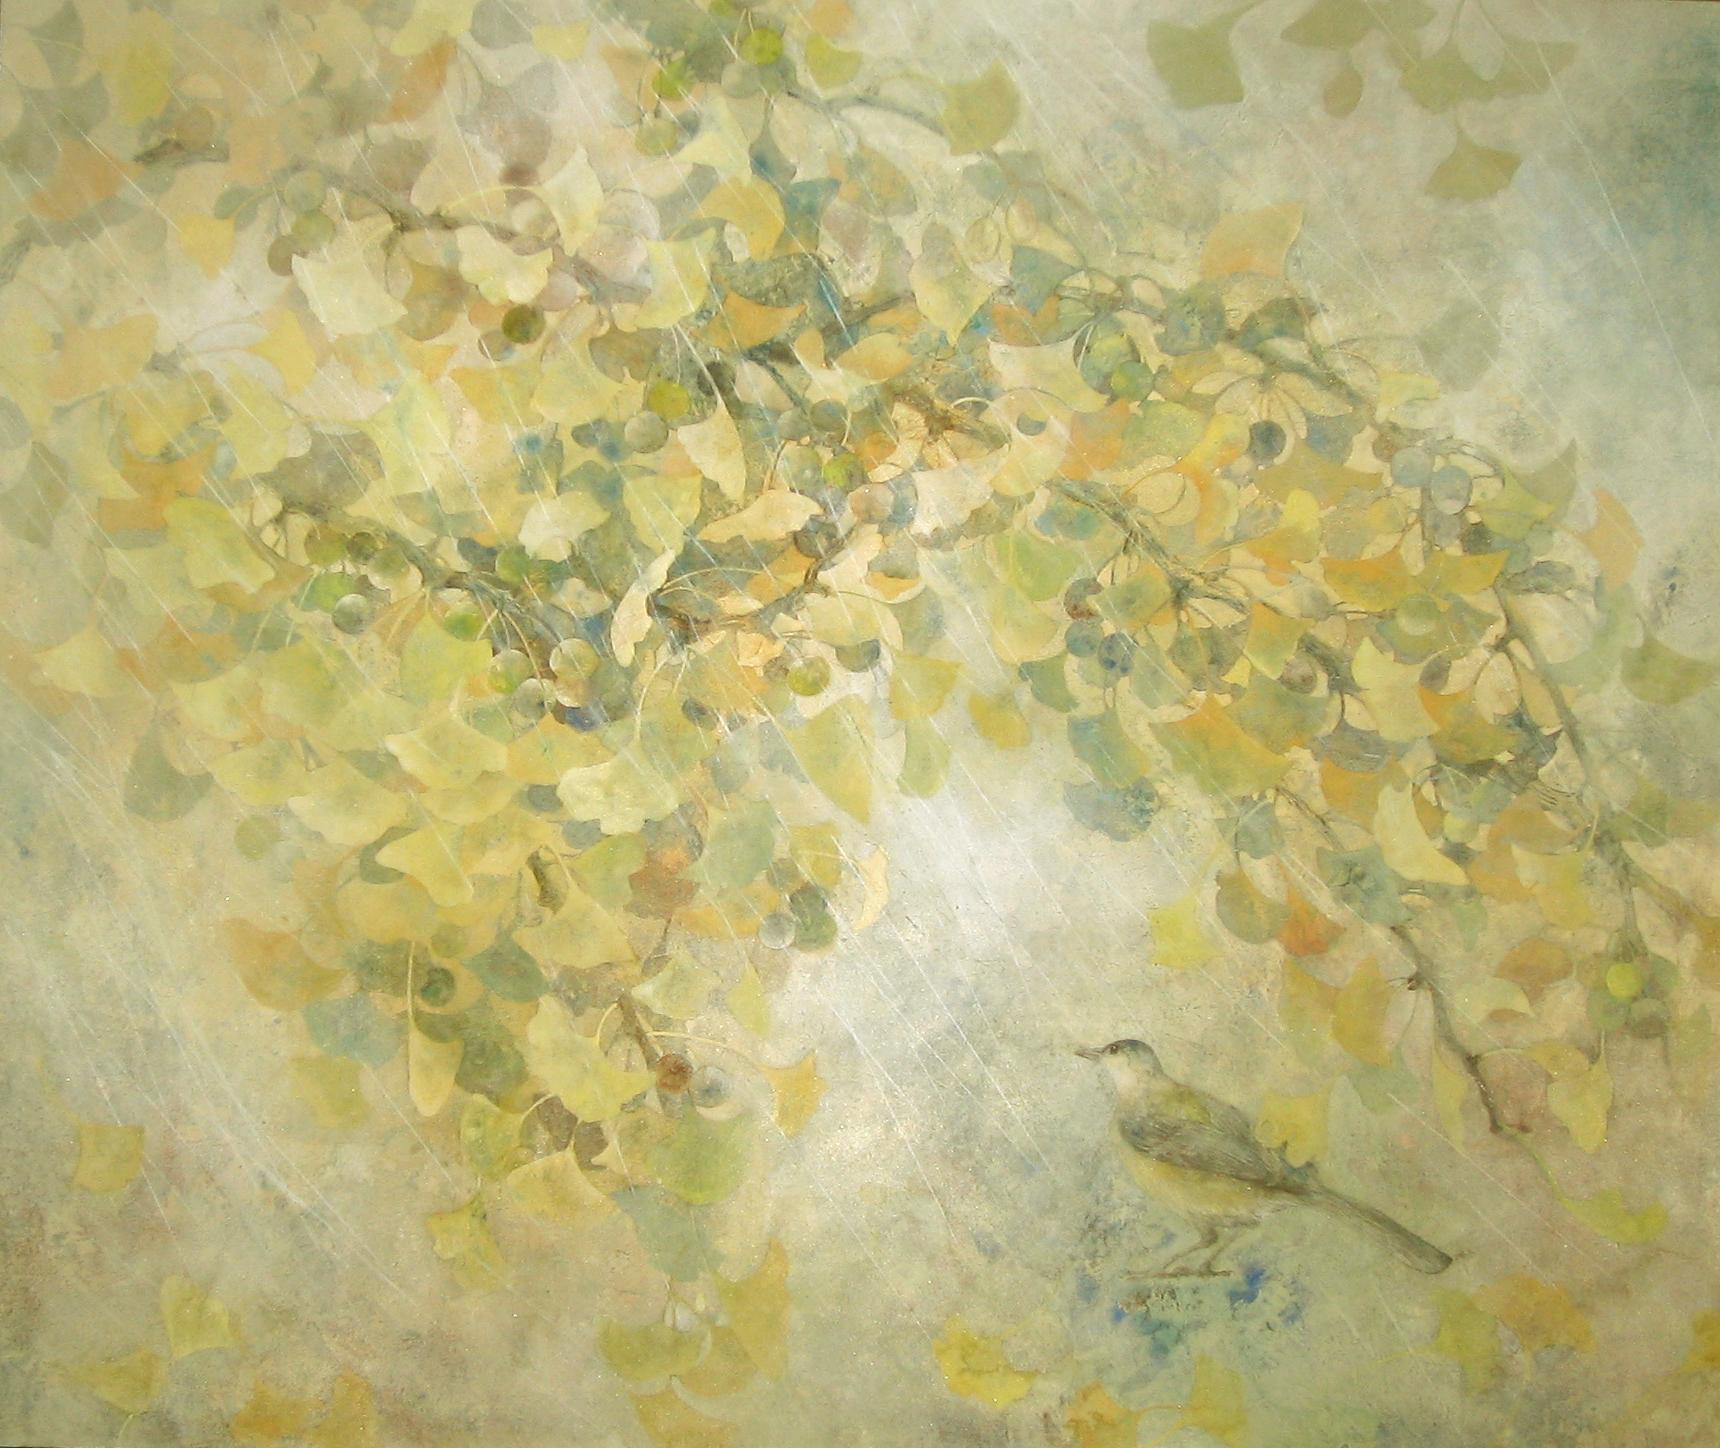 Hiver, Contemporary Nihonga (Japanese Painting)